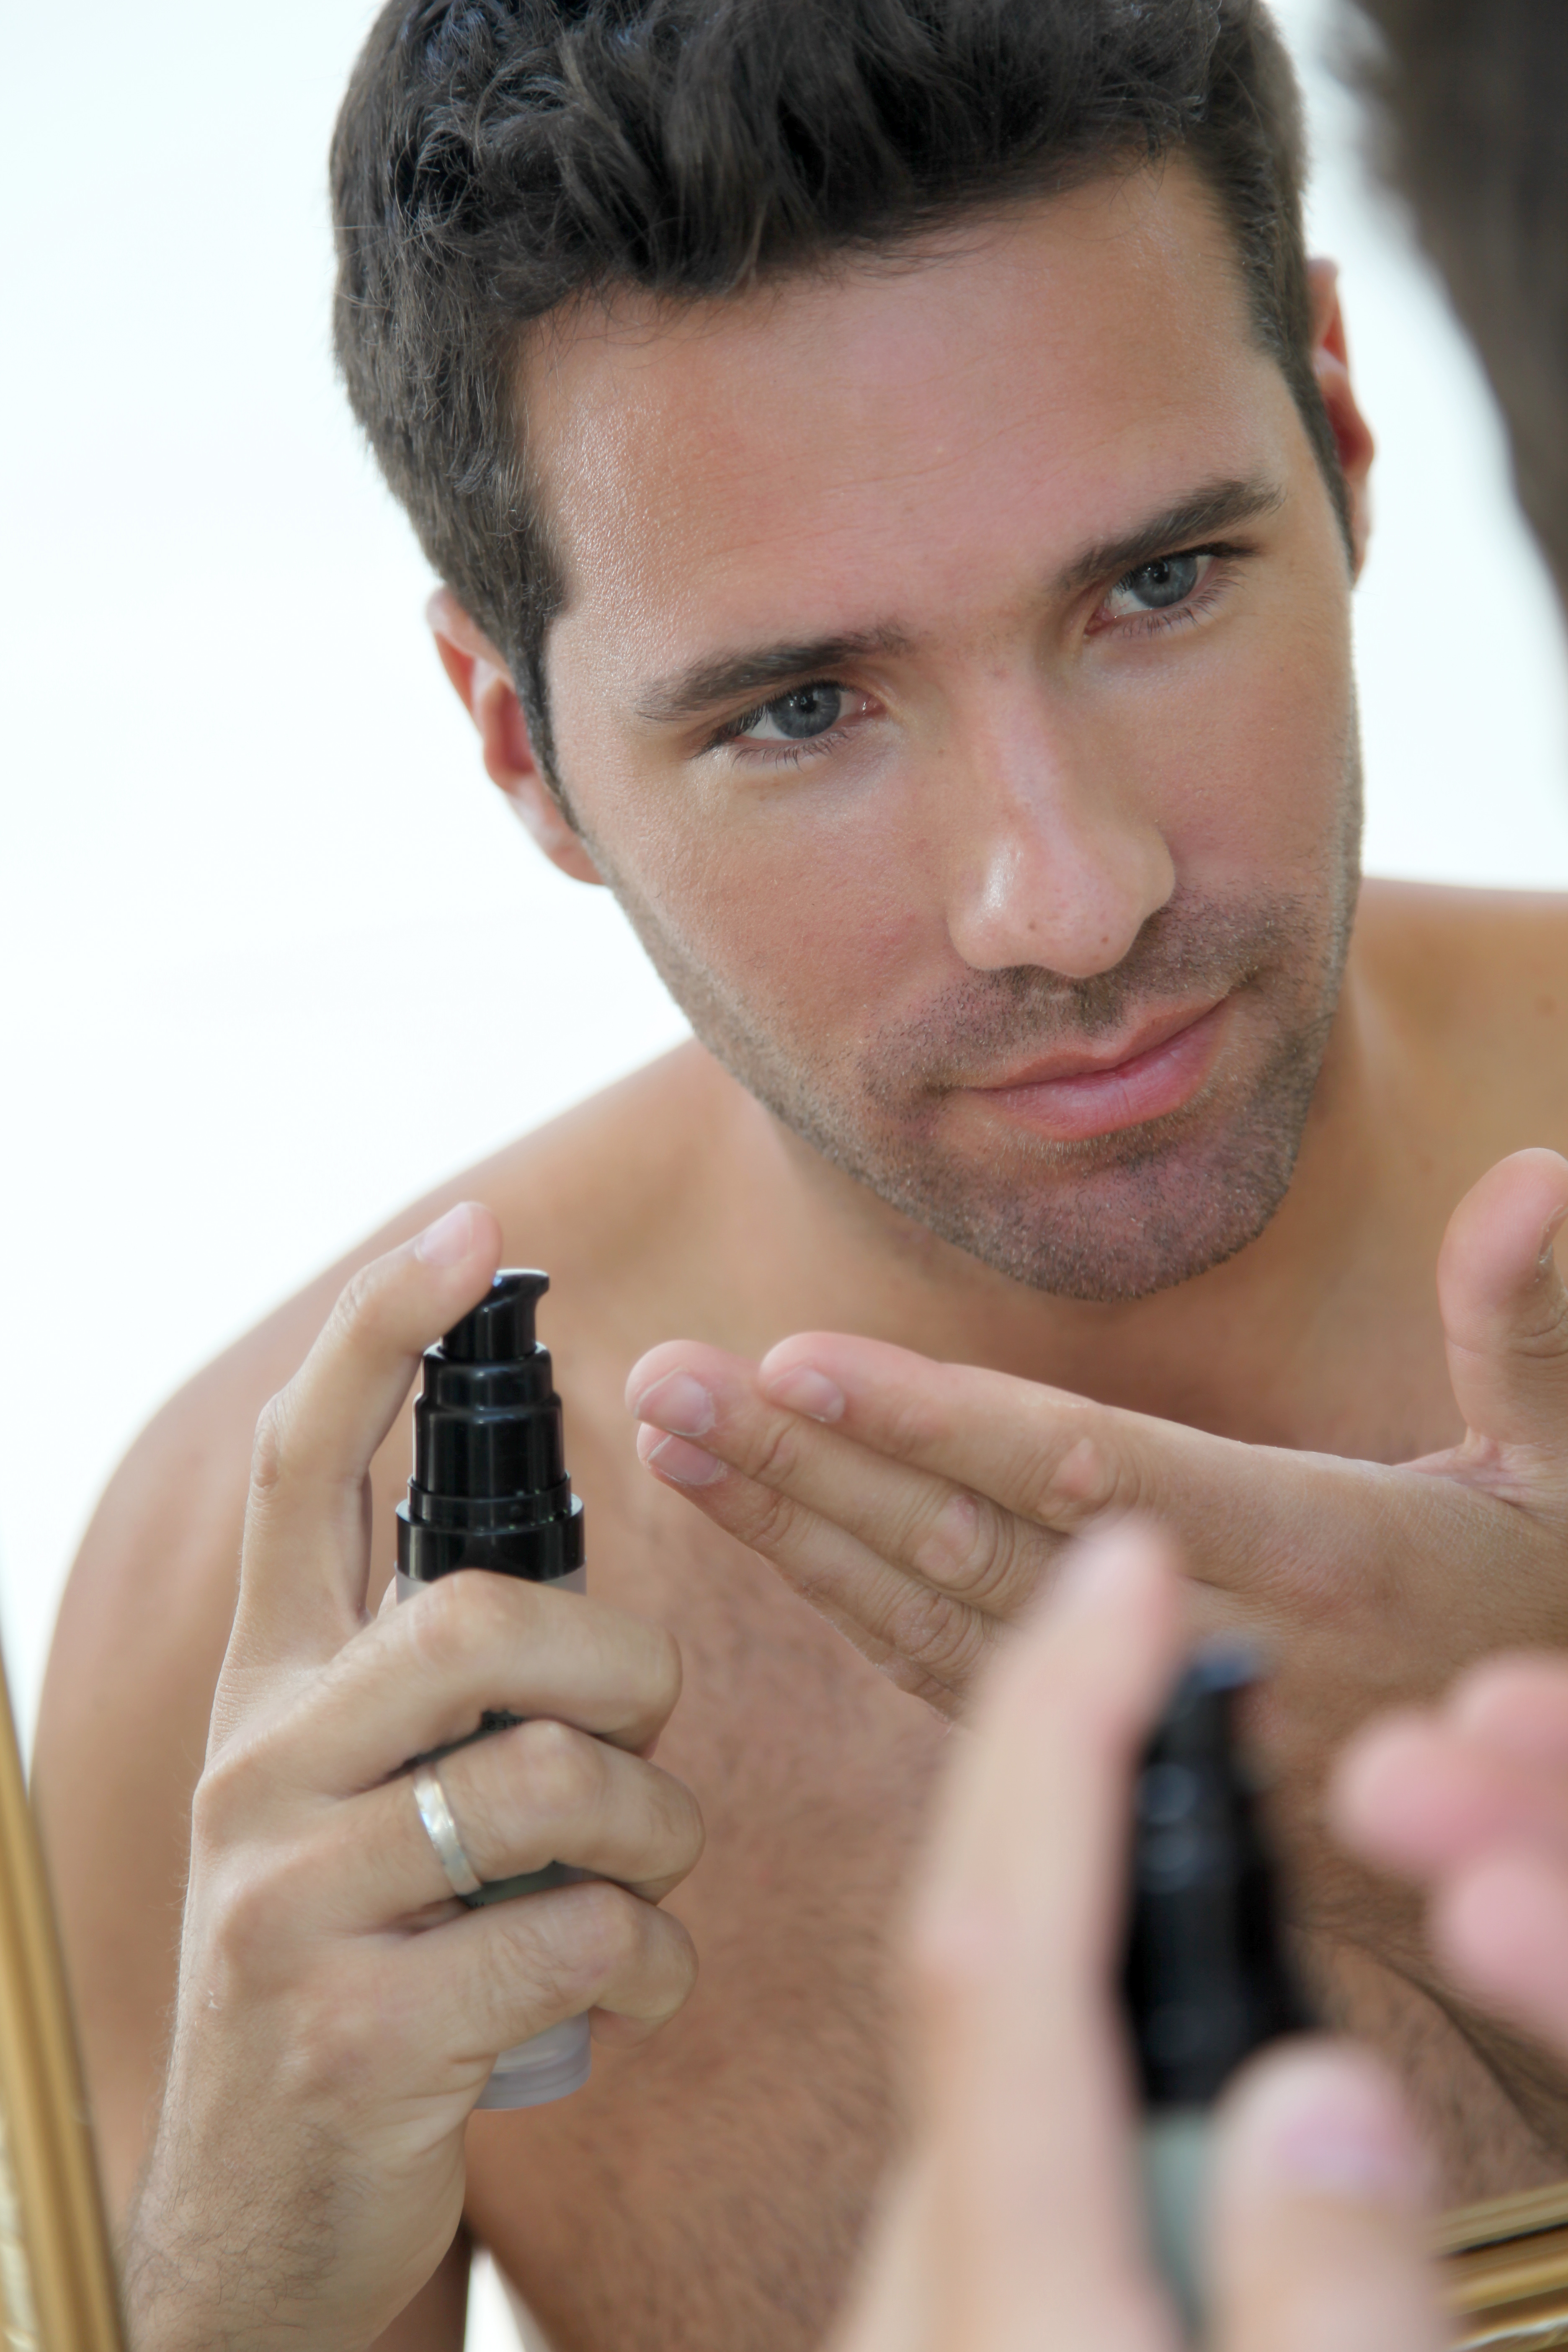 man skin-care